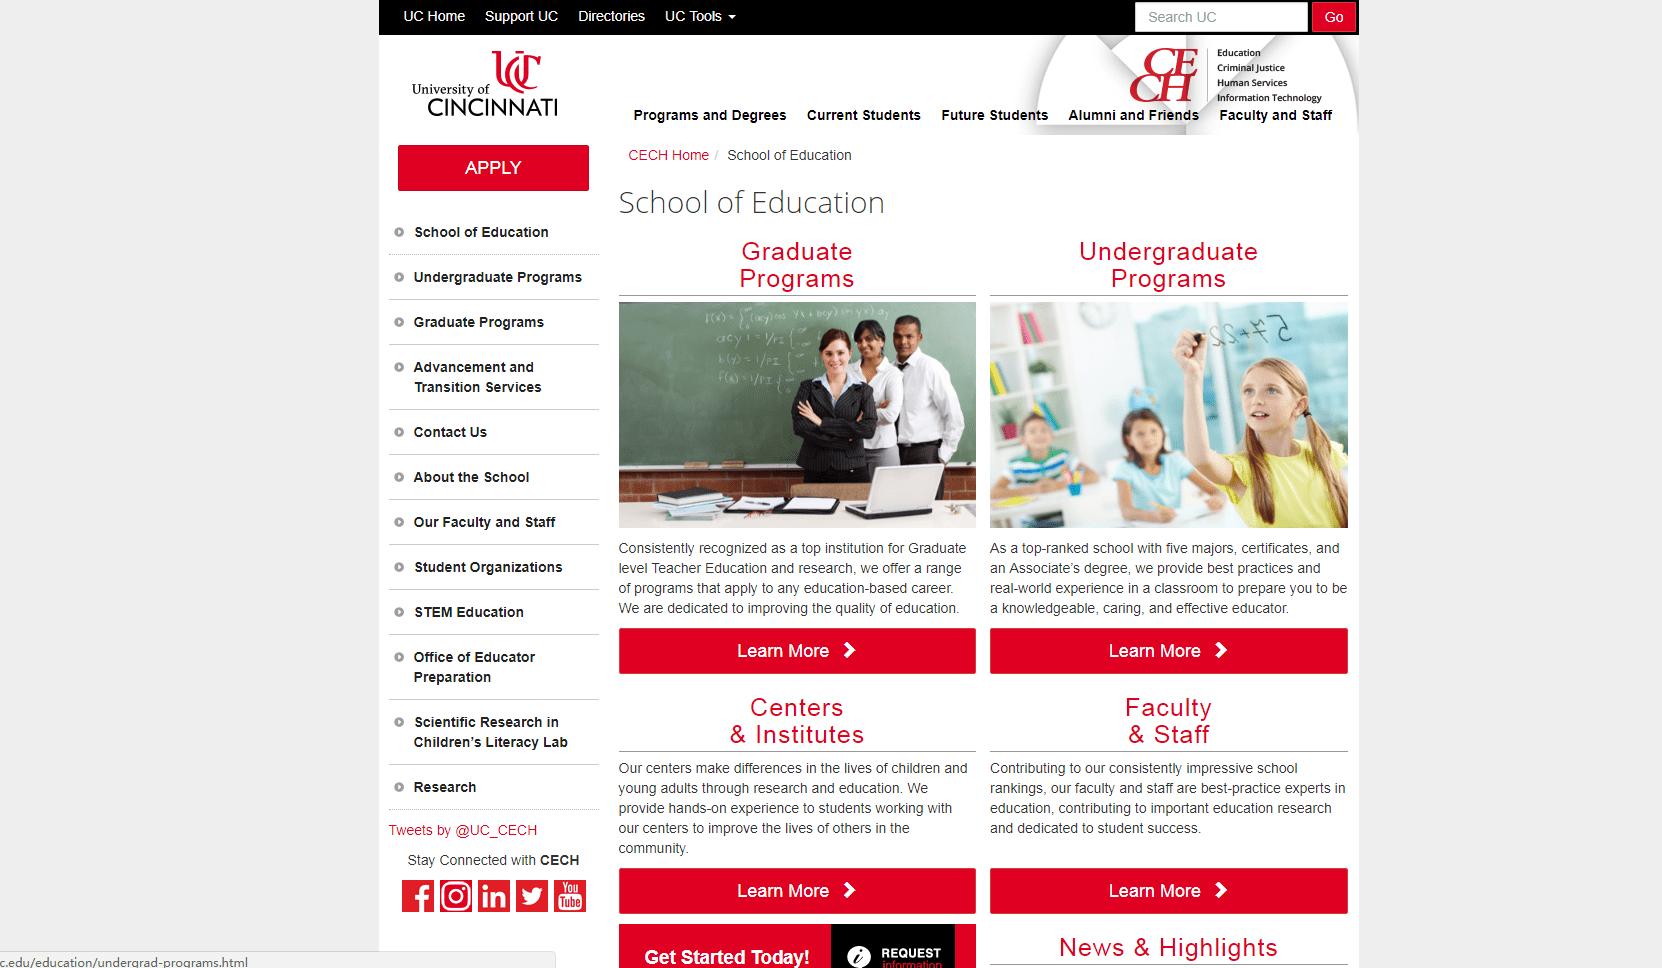 University of Cincinnati School of Education